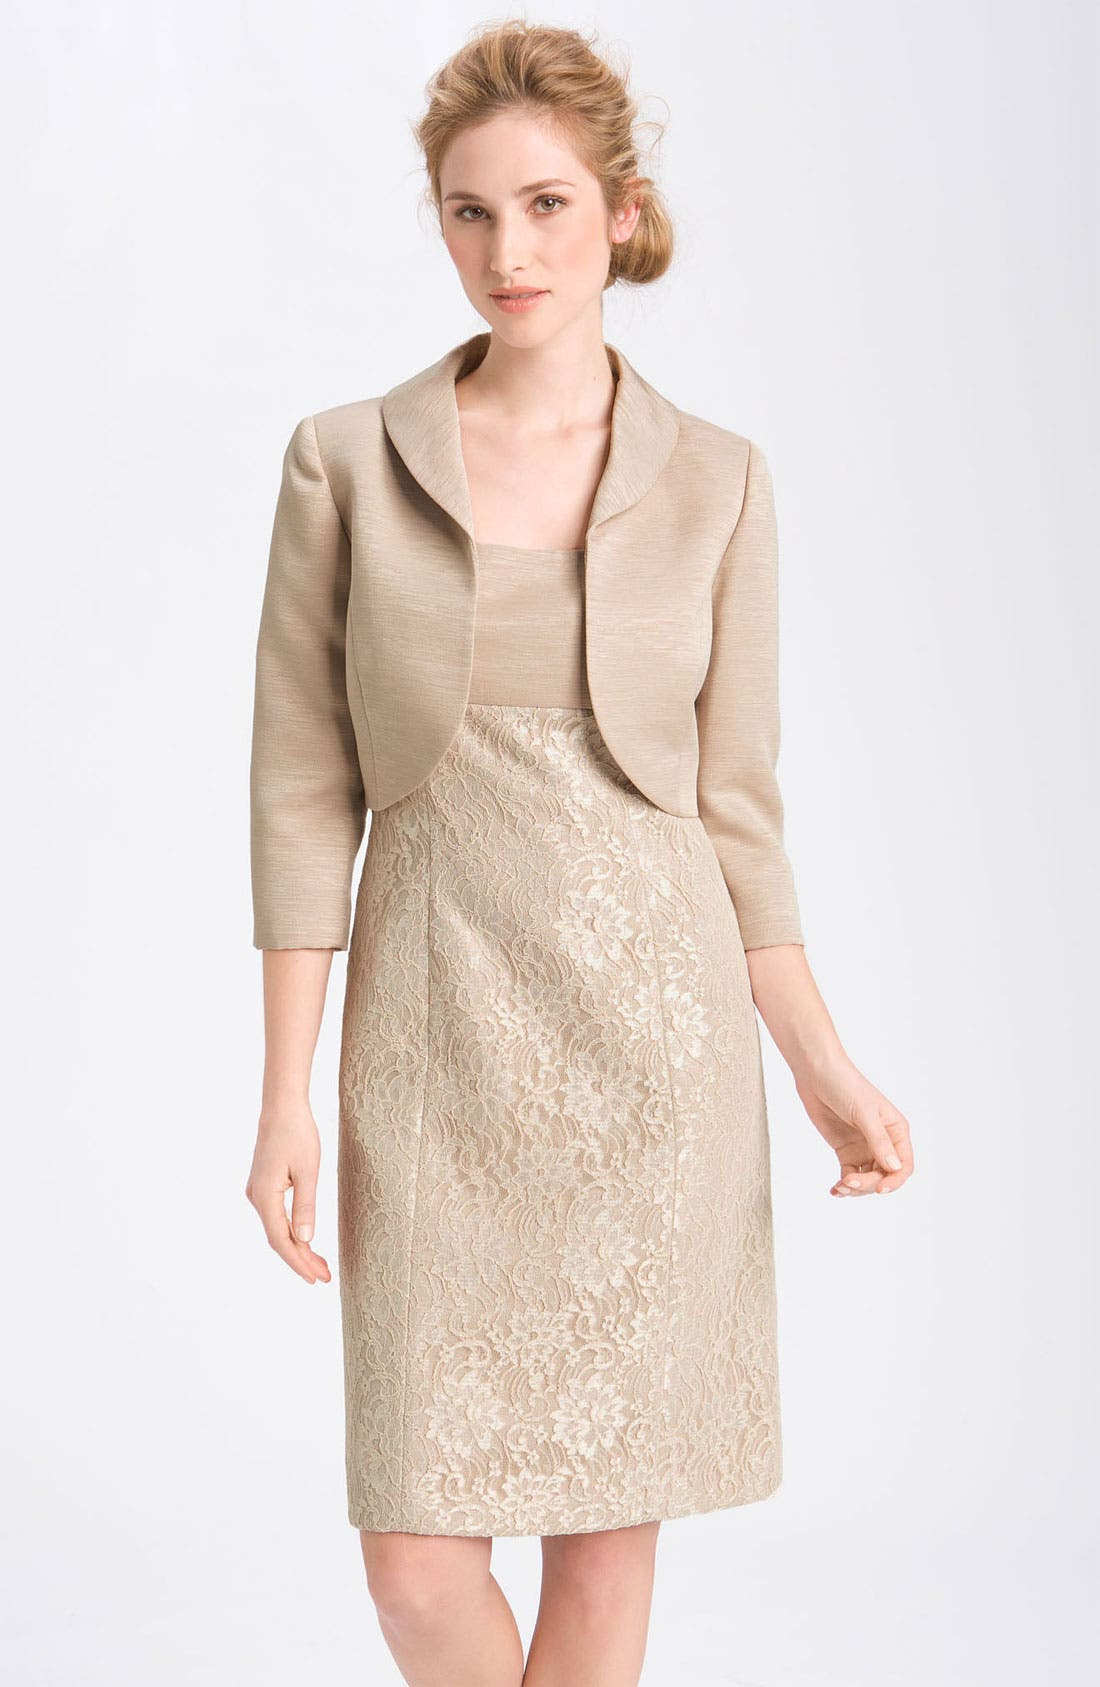 Alternate Image 1 Selected - Tahari Lace Sheath Dress & Jacket